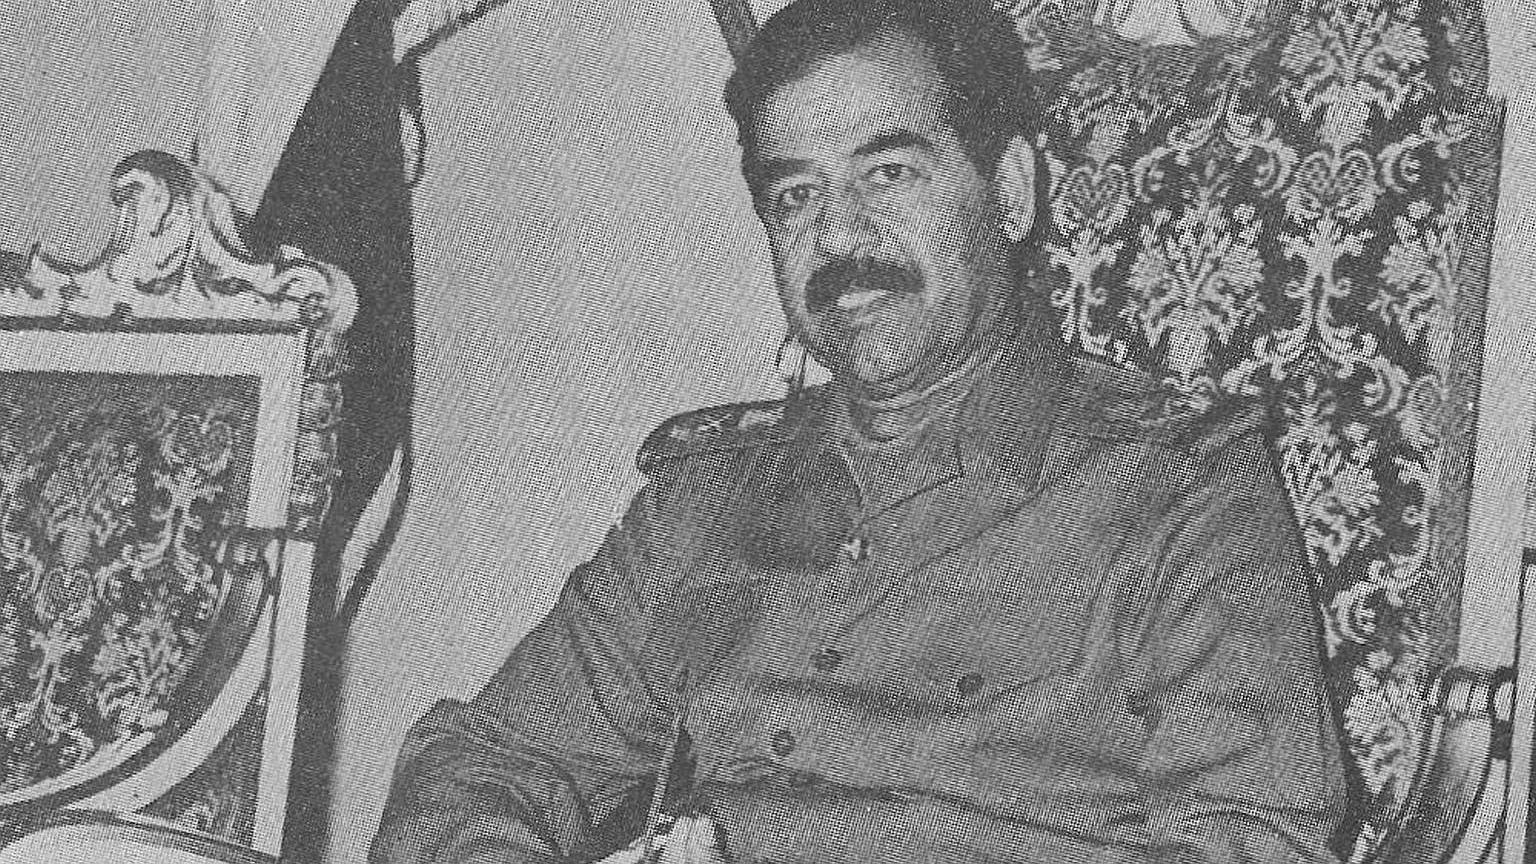 Saddam Husajn w 1988 roku